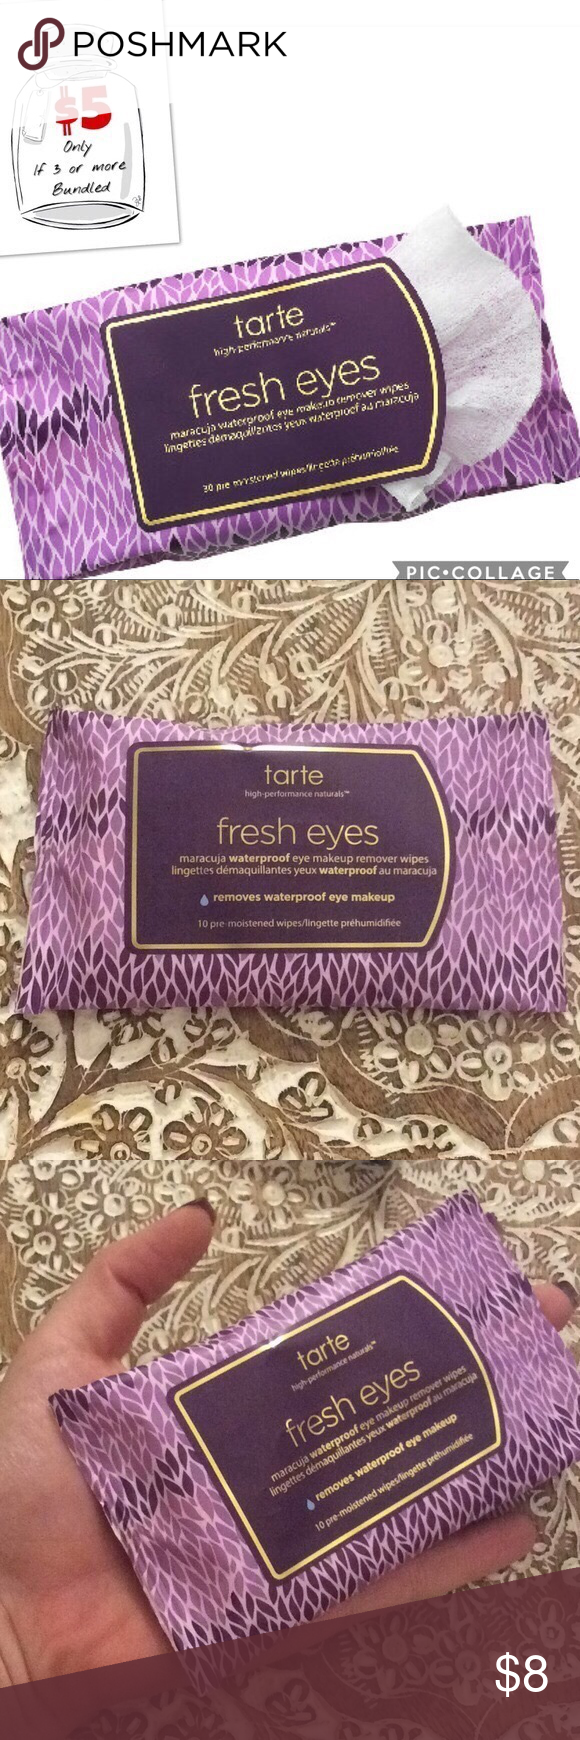 New TARTE Fresh Eyes Eye Makeup Remover Wipes Brand new 10